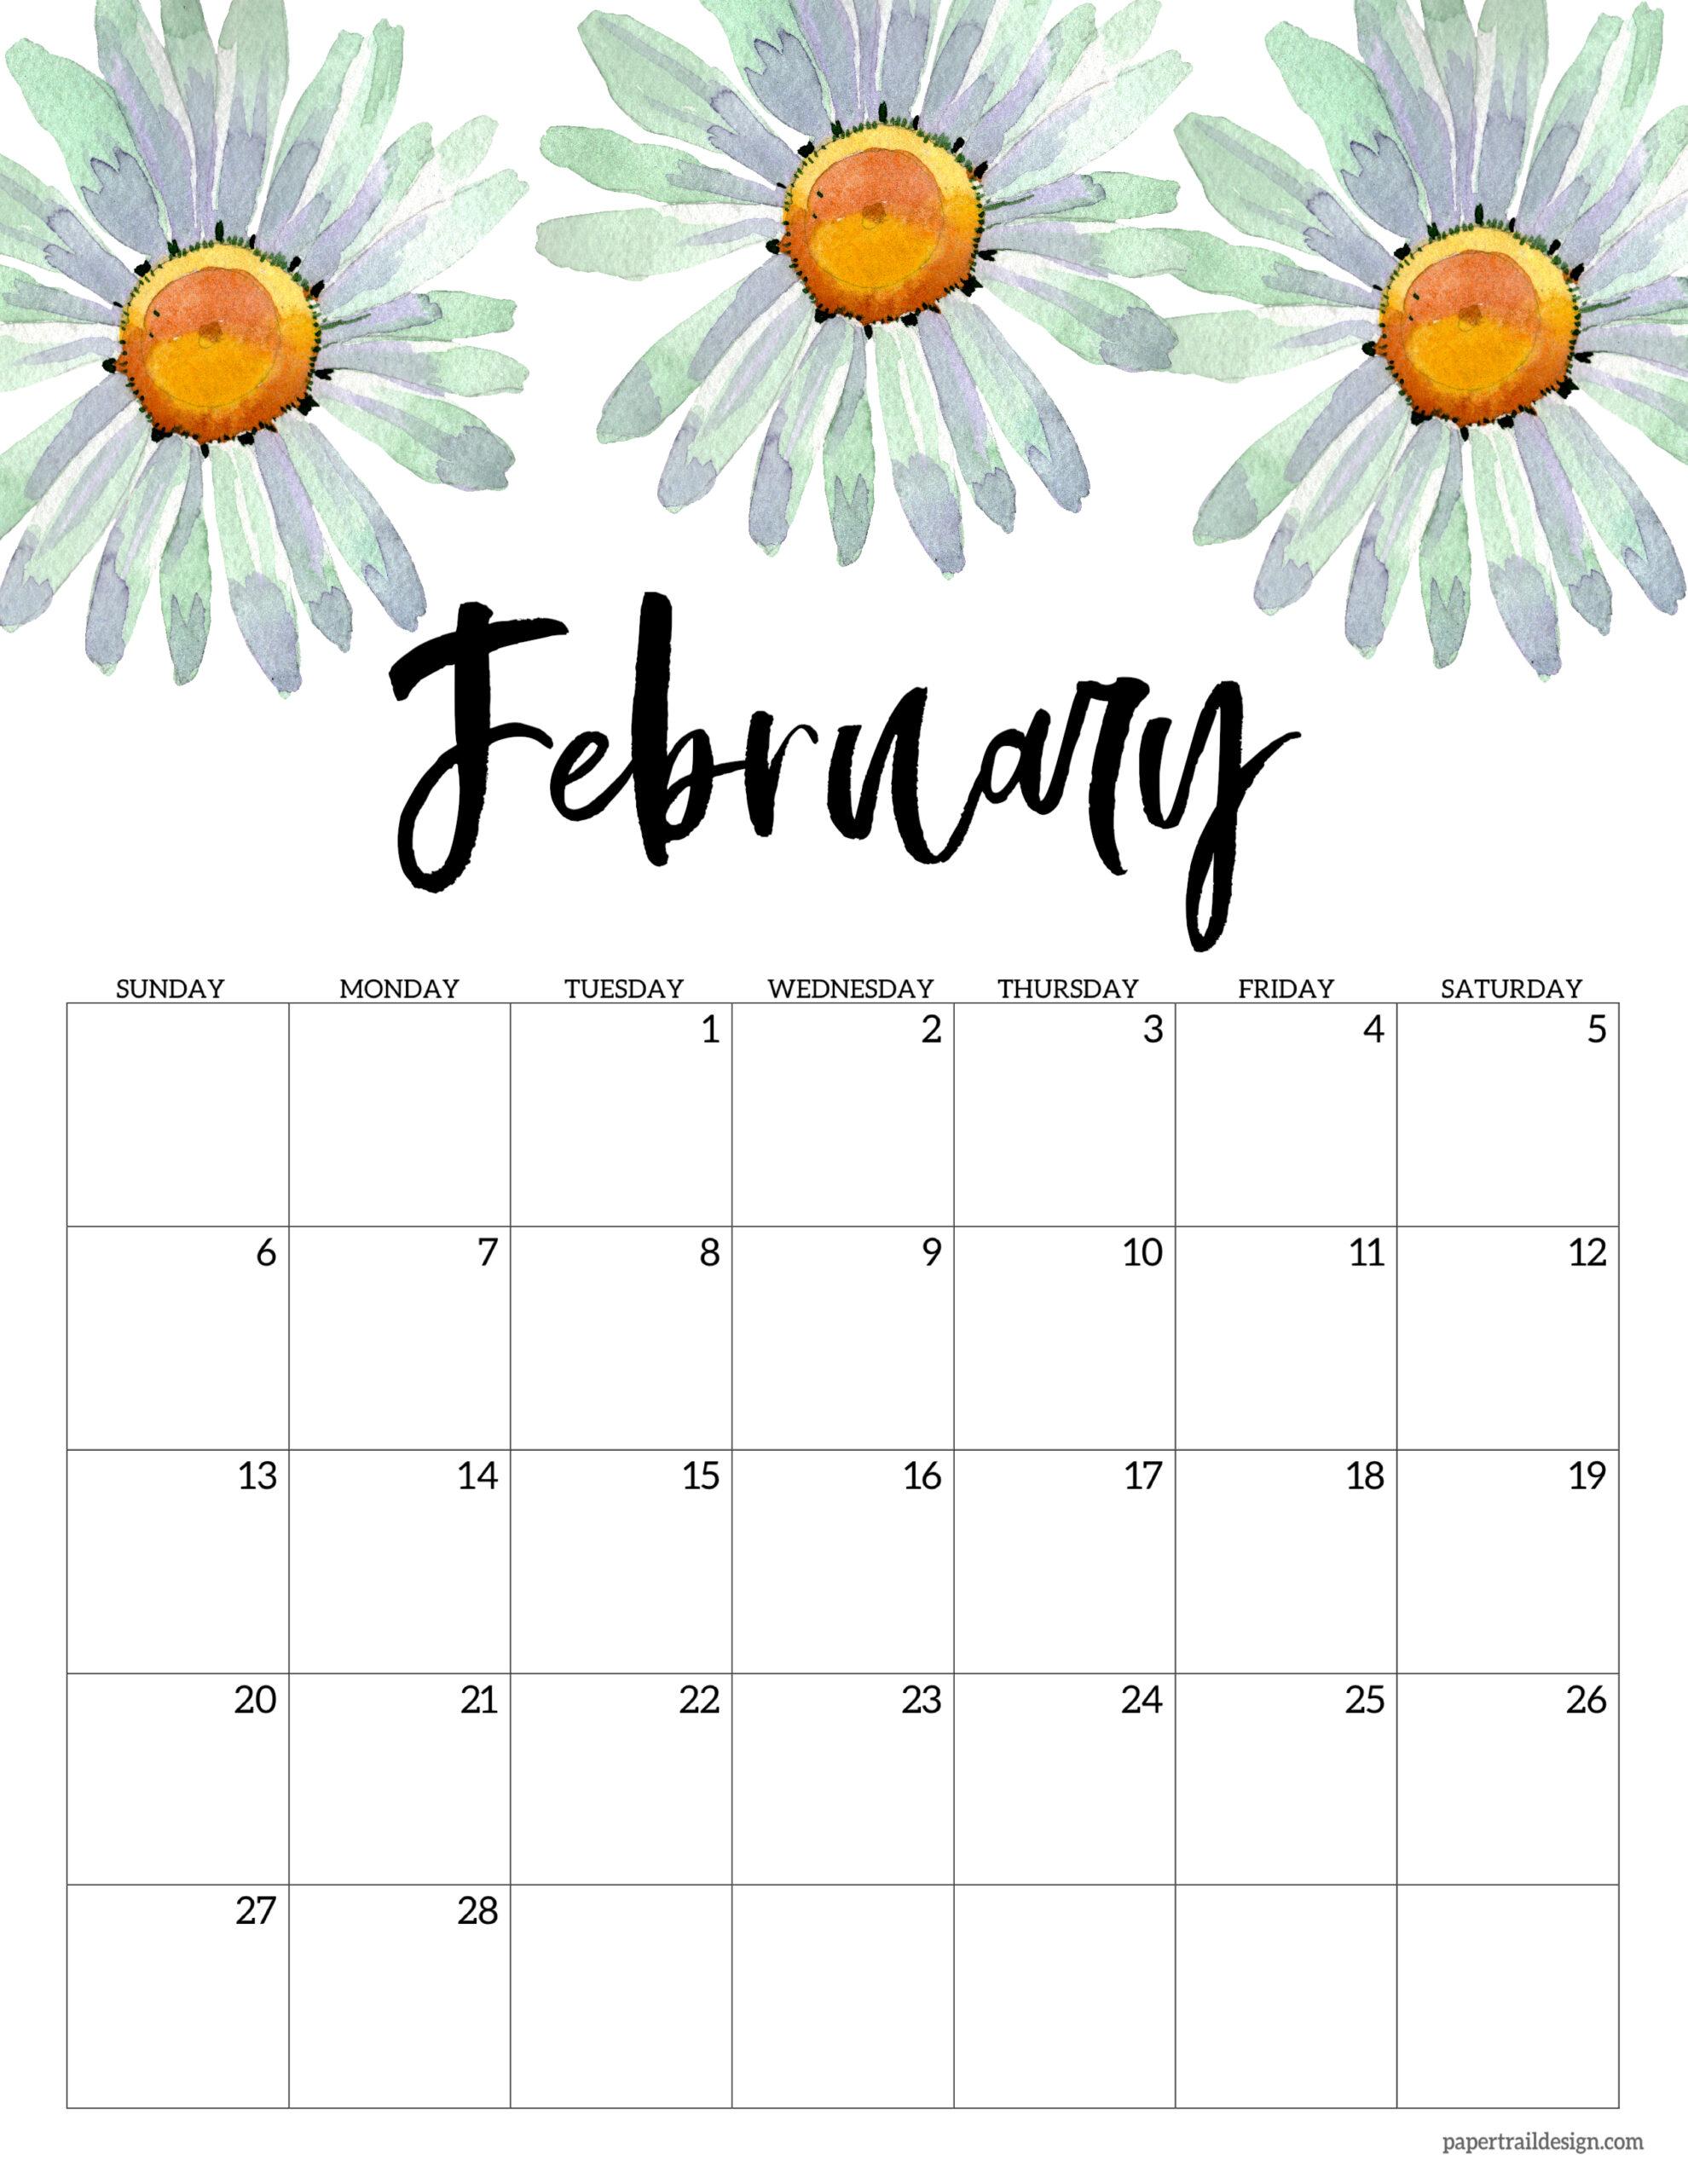 2022 Free Printable Calendar Floral Paper Trail Design